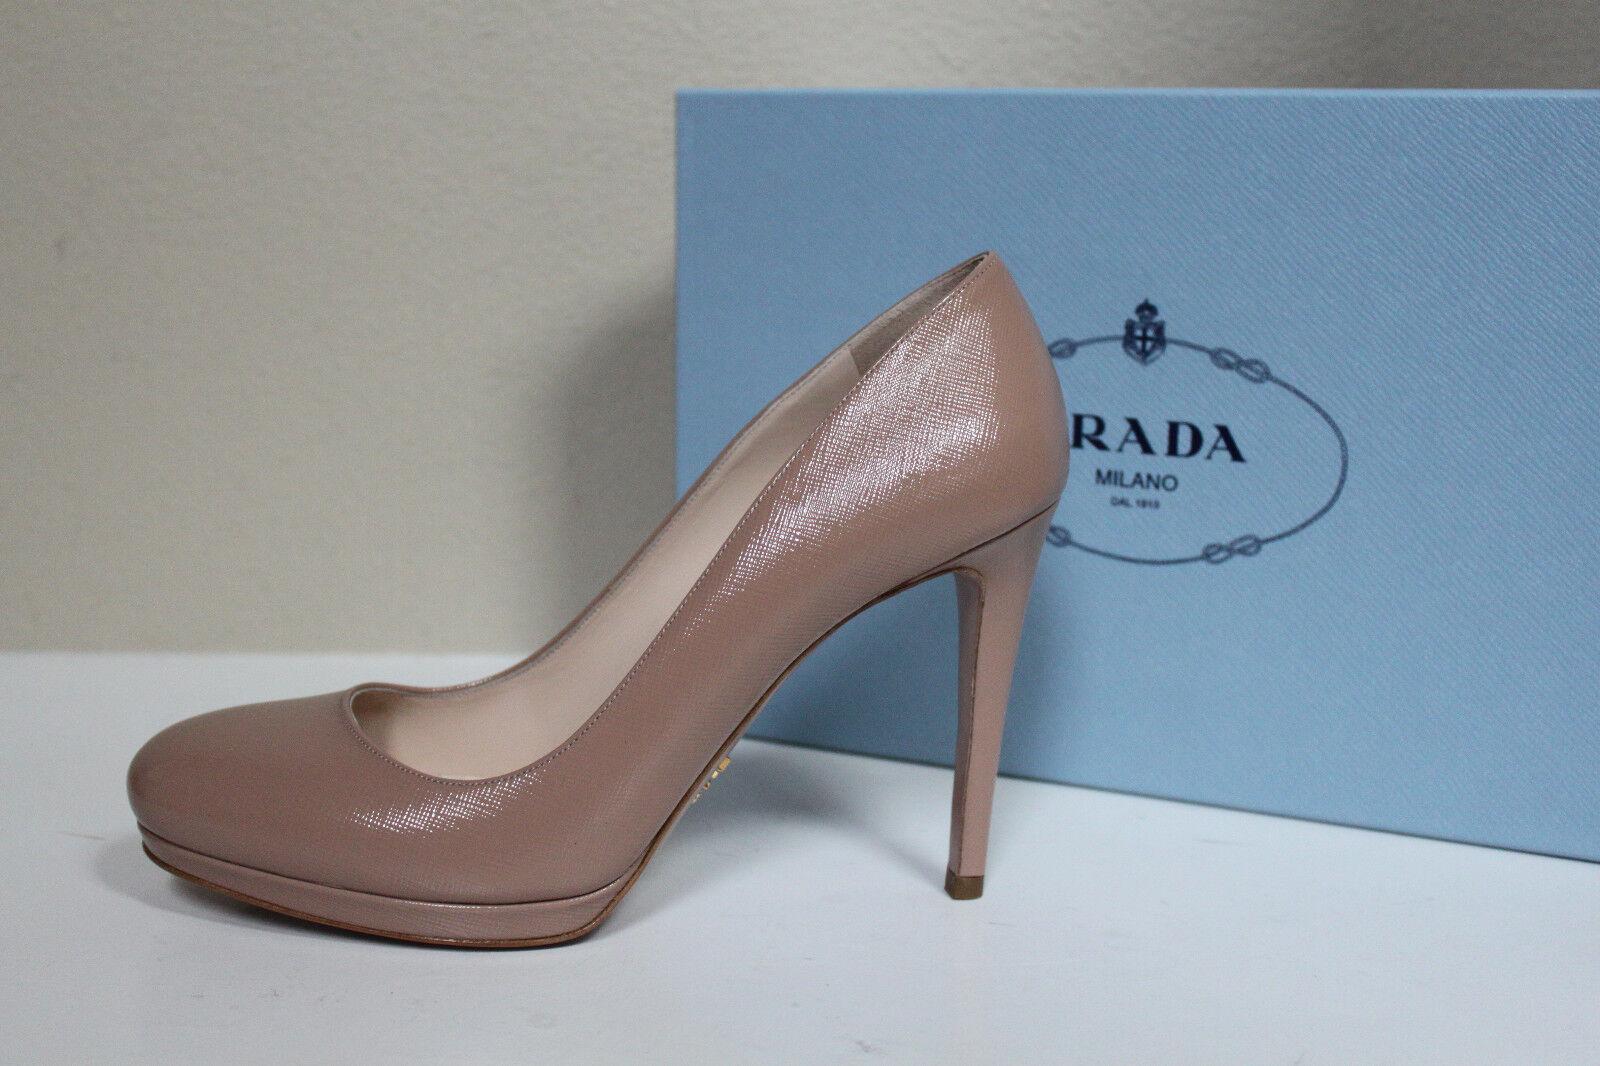 New sz 9.5 US   39.5 Prada Nude Patent Leather Round Toe Classic Pump Heel shoes